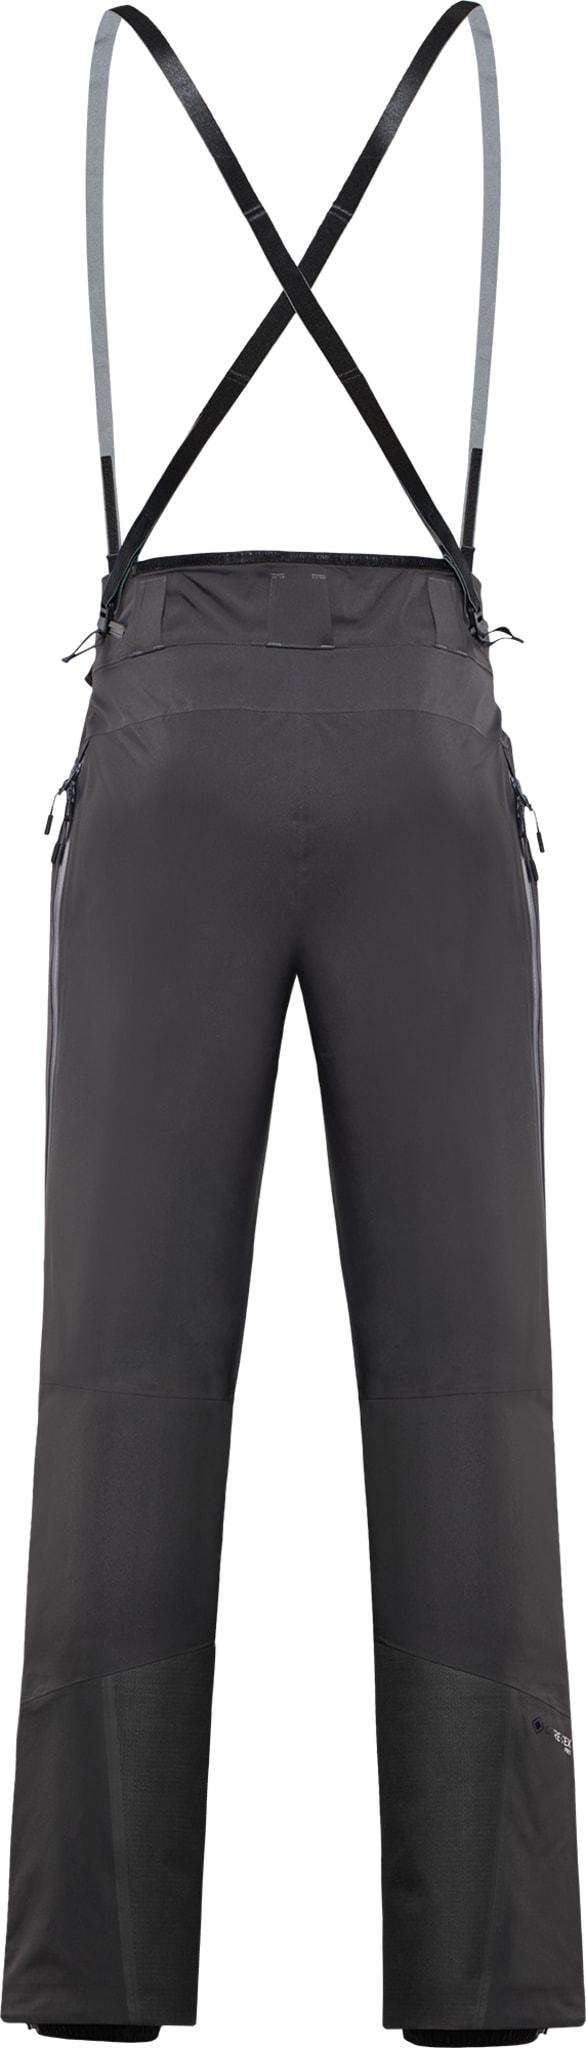 Amrit Pants Ms